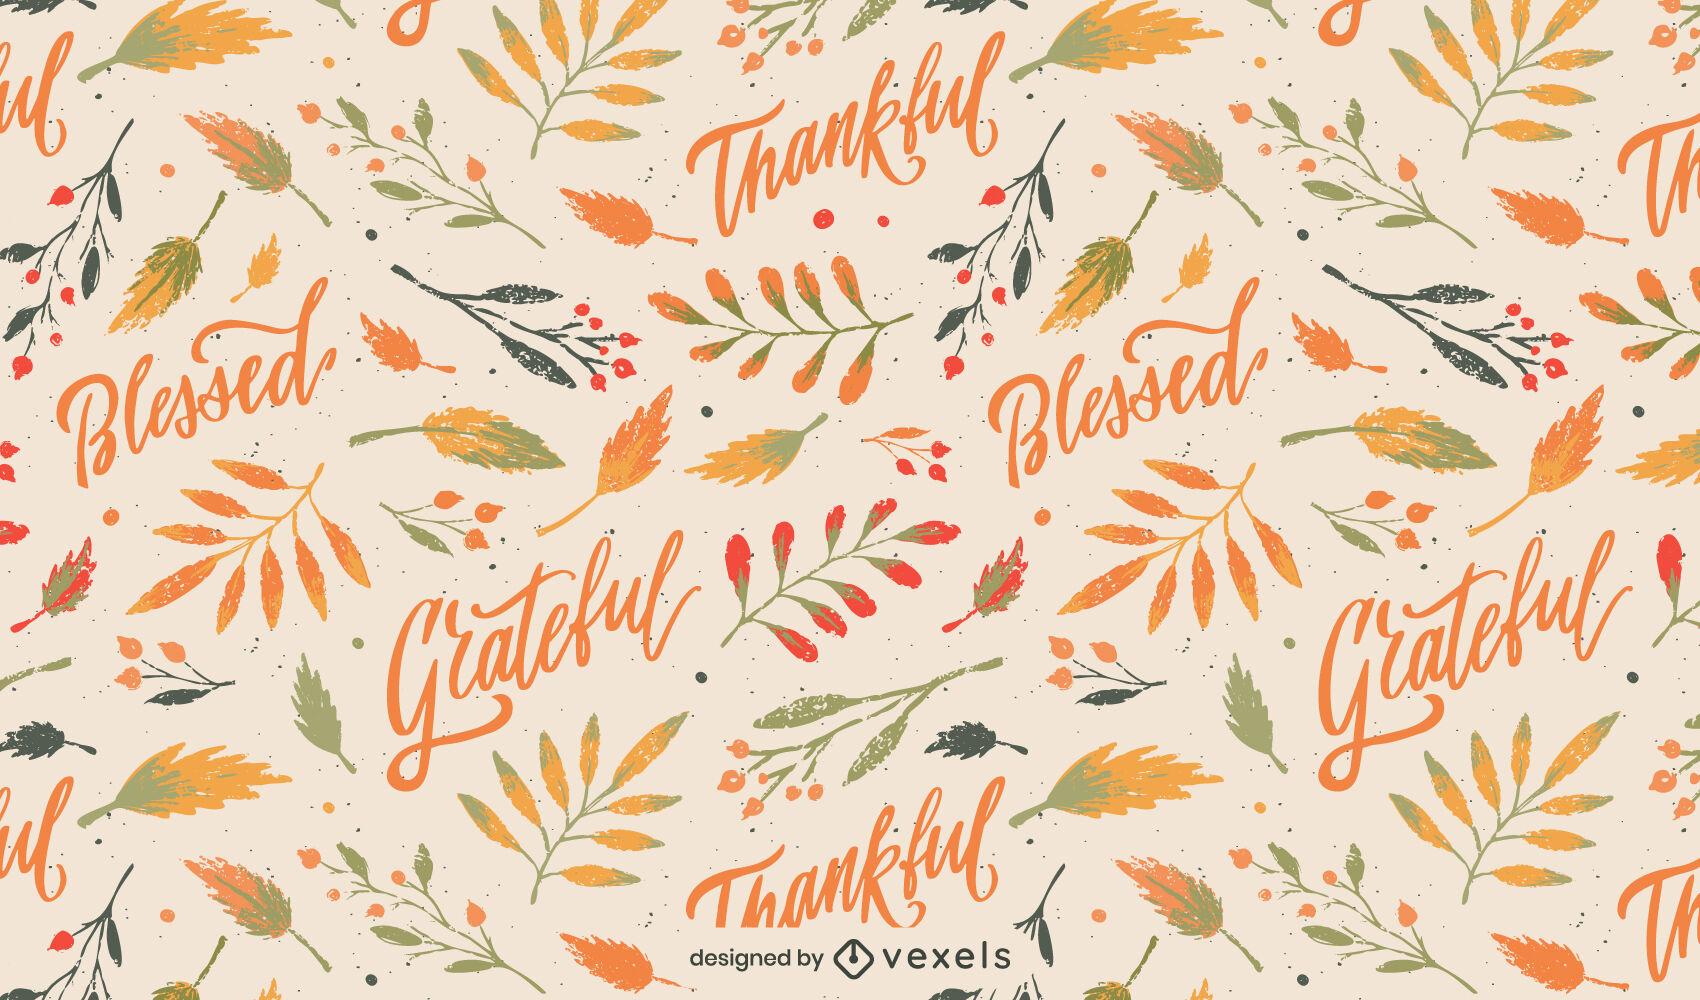 Diseño de patrón de naturaleza de letras de acción de gracias